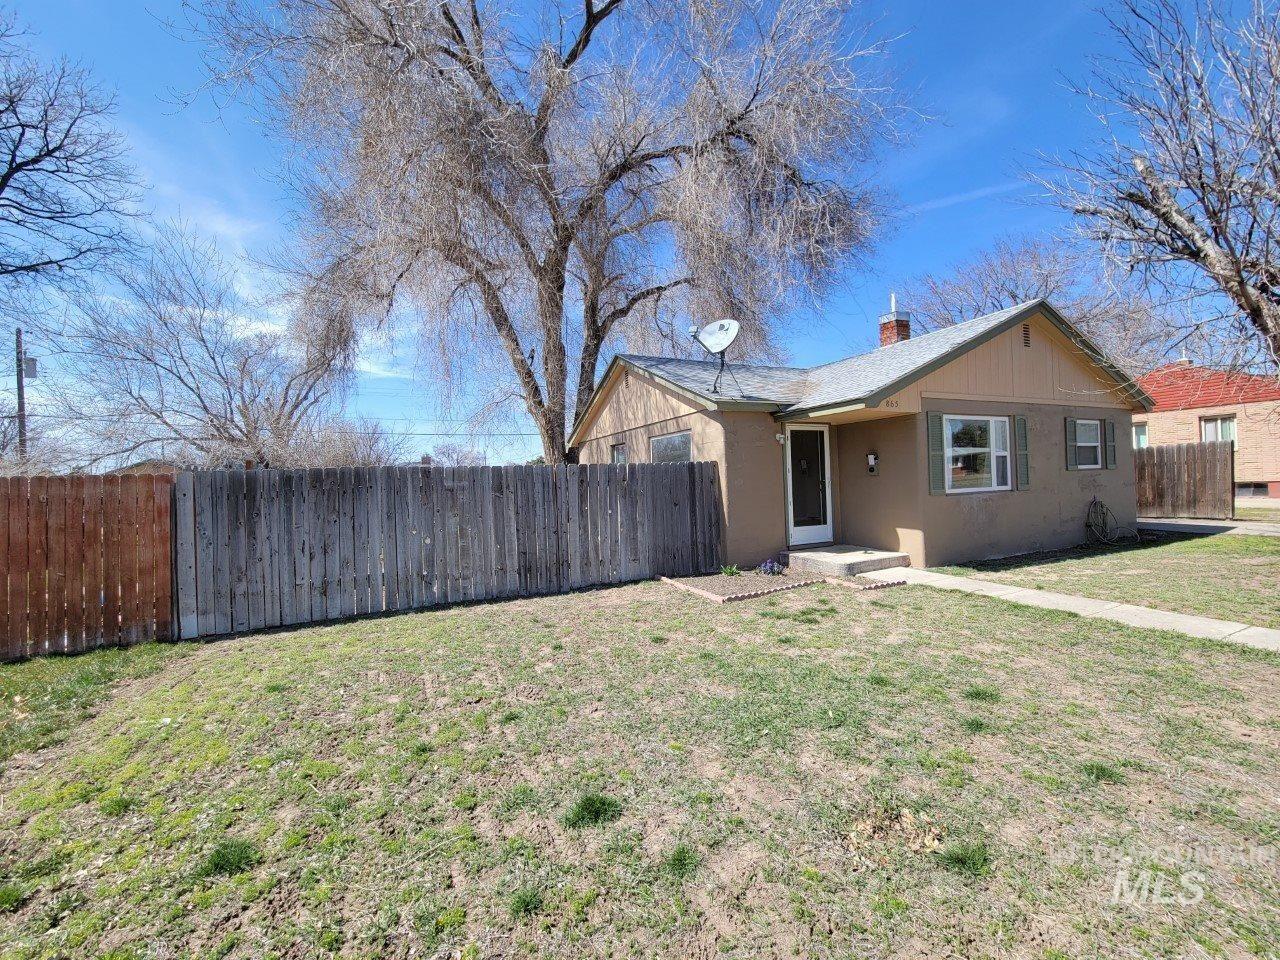 Photo of 865 N 8th E, Mountain Home, ID 83647 (MLS # 98798285)